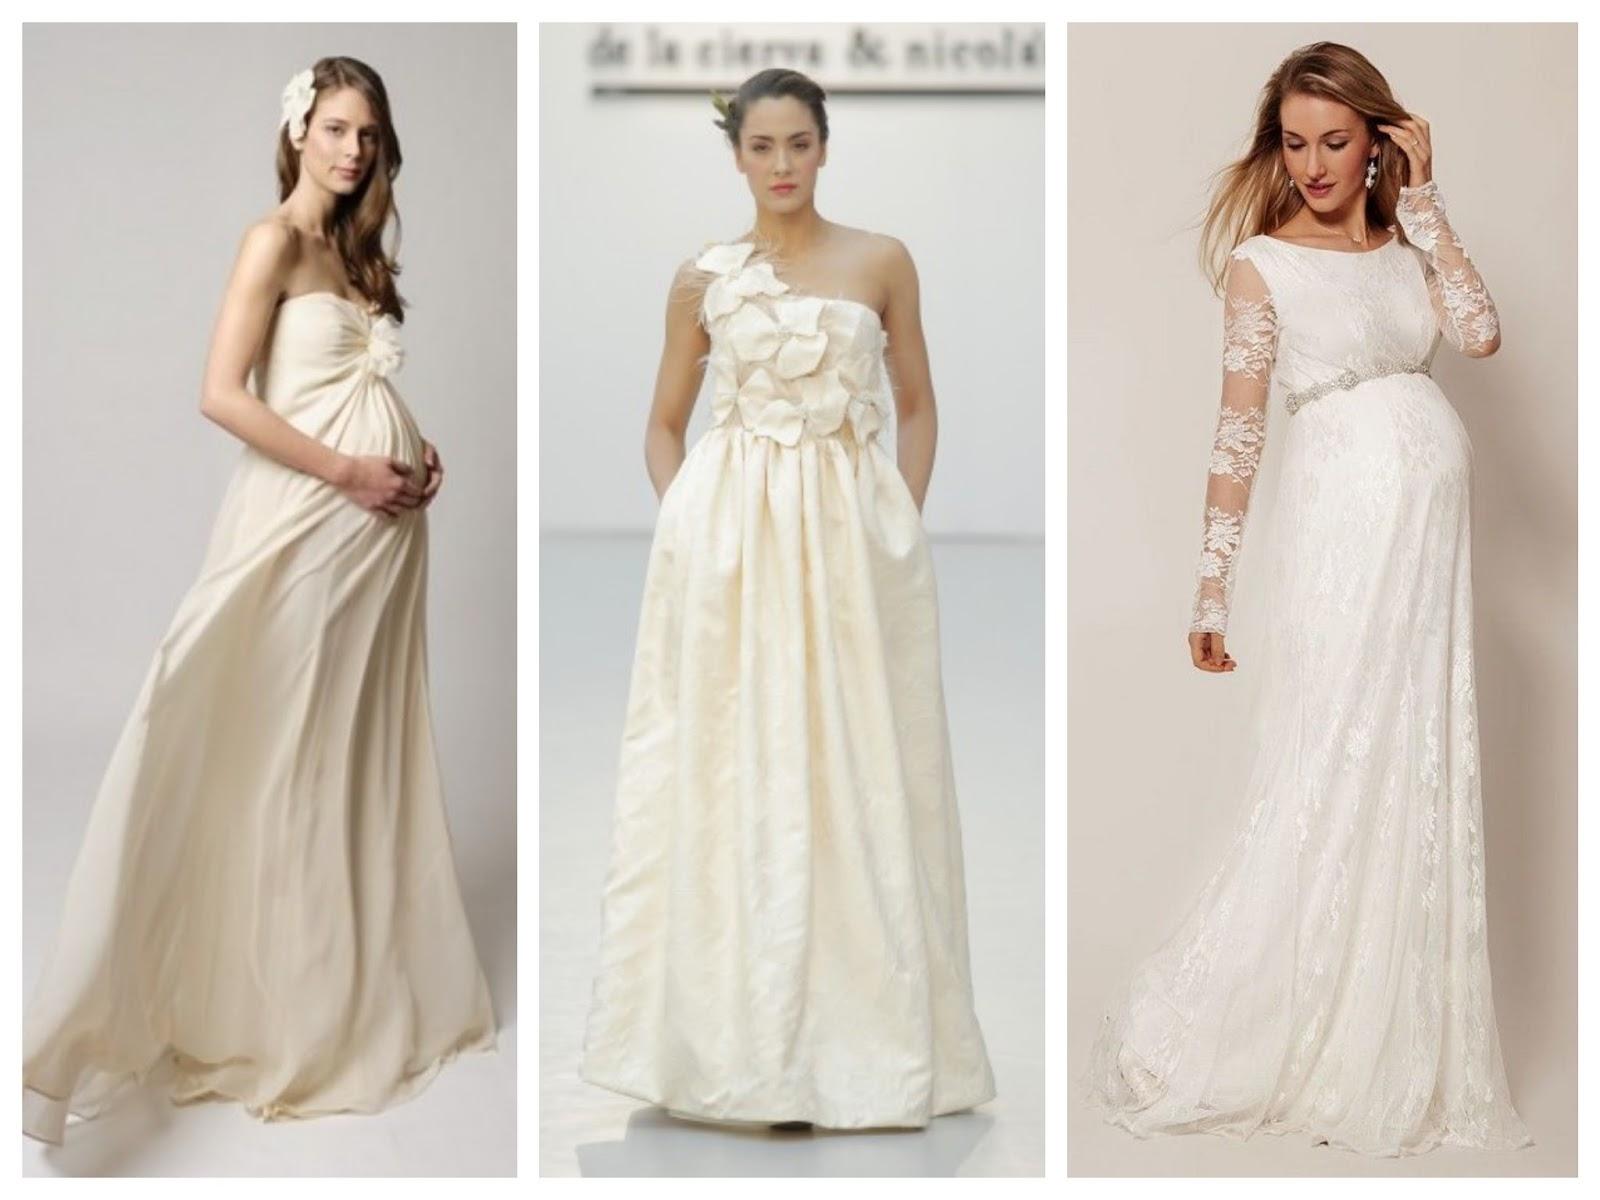 vestidos de novia embarazada 4 meses